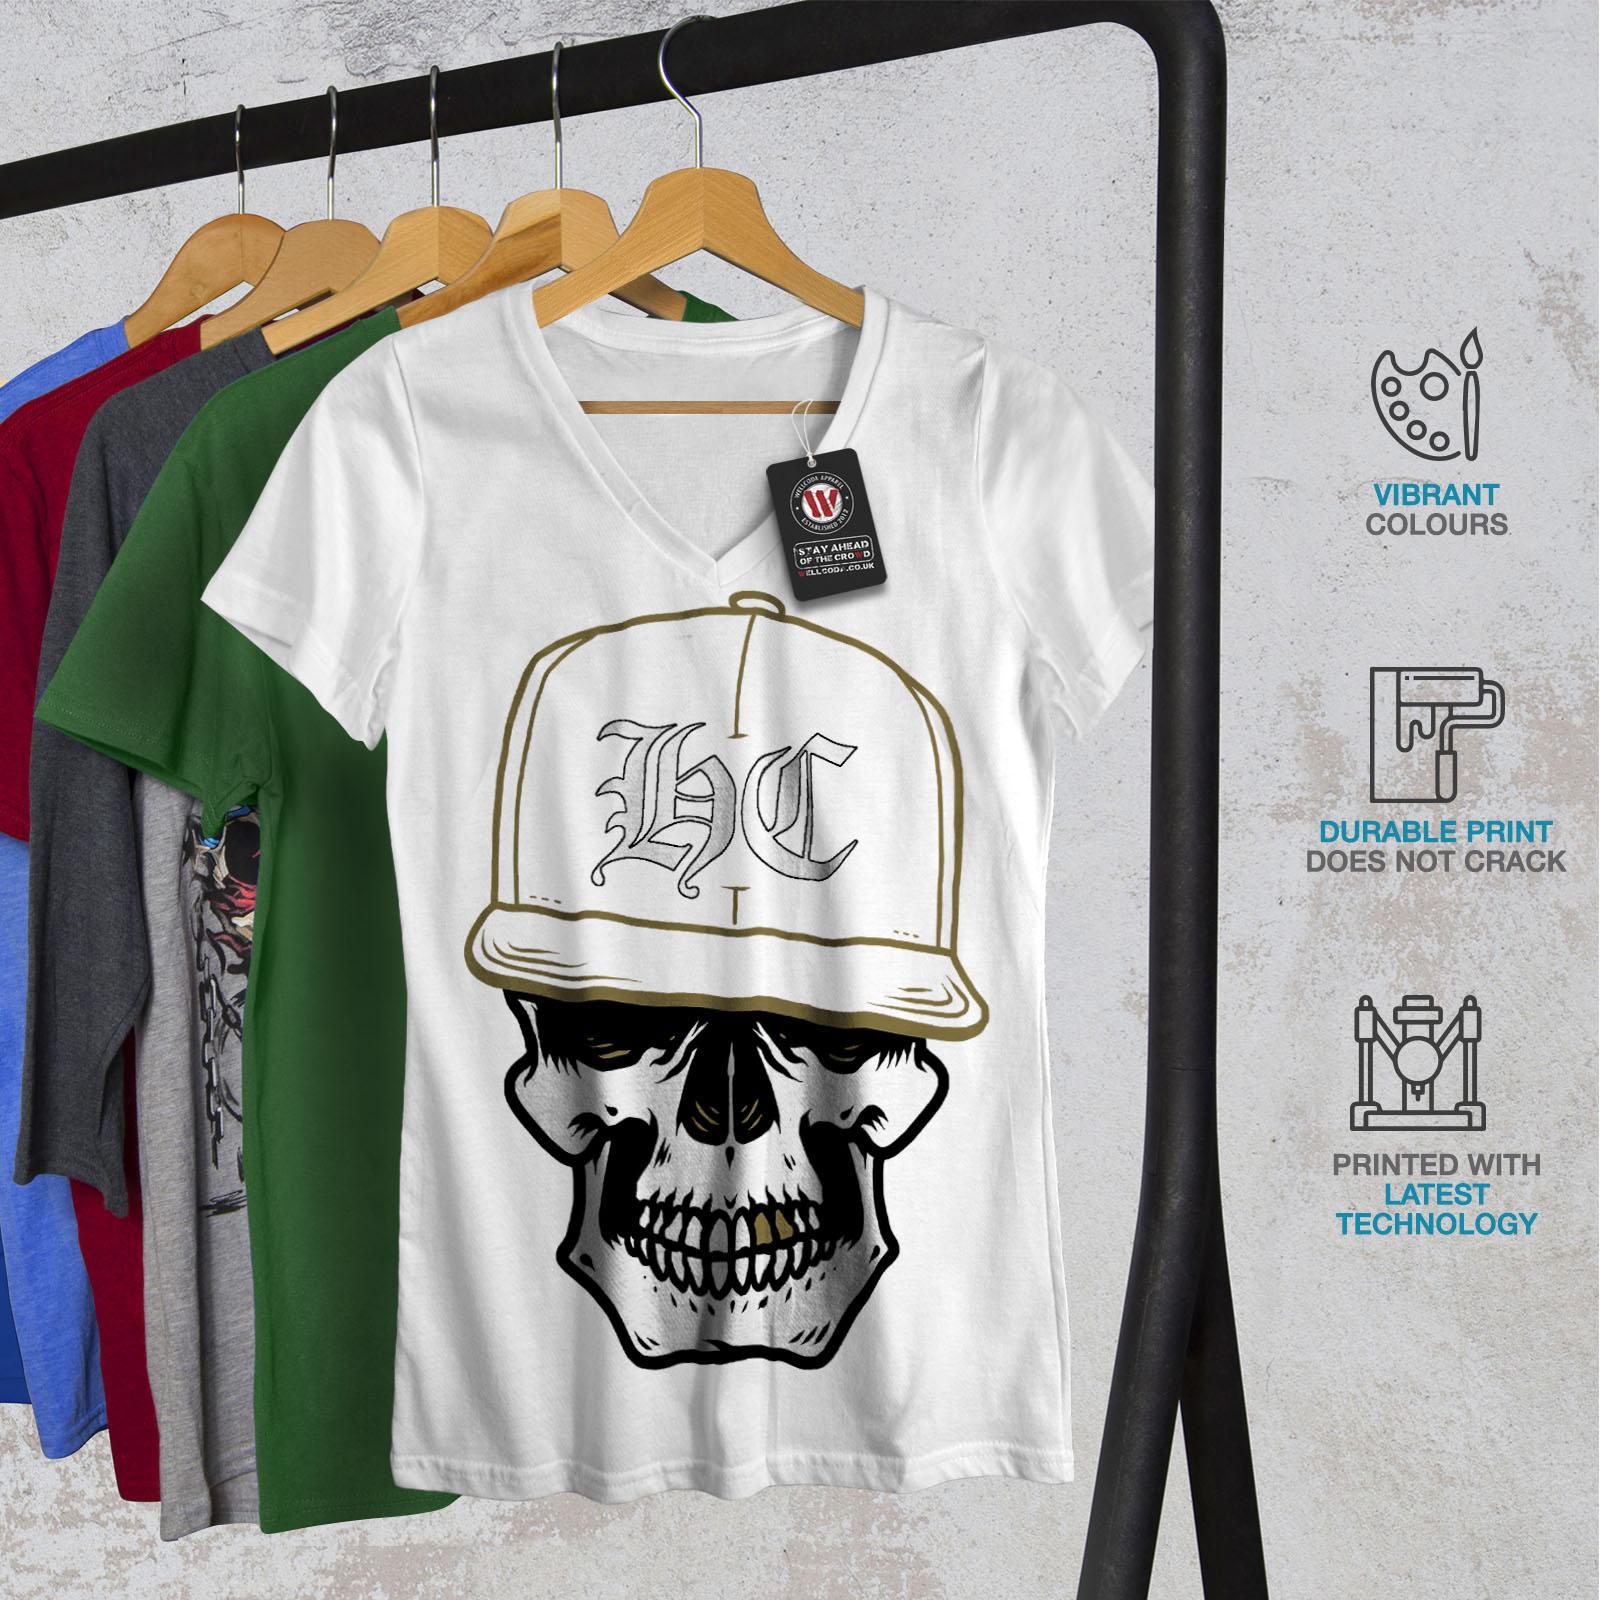 miniature 8 - Wellcoda Skull Swag Gamer Womens V-Neck T-shirt, Rapper Graphic Design Tee